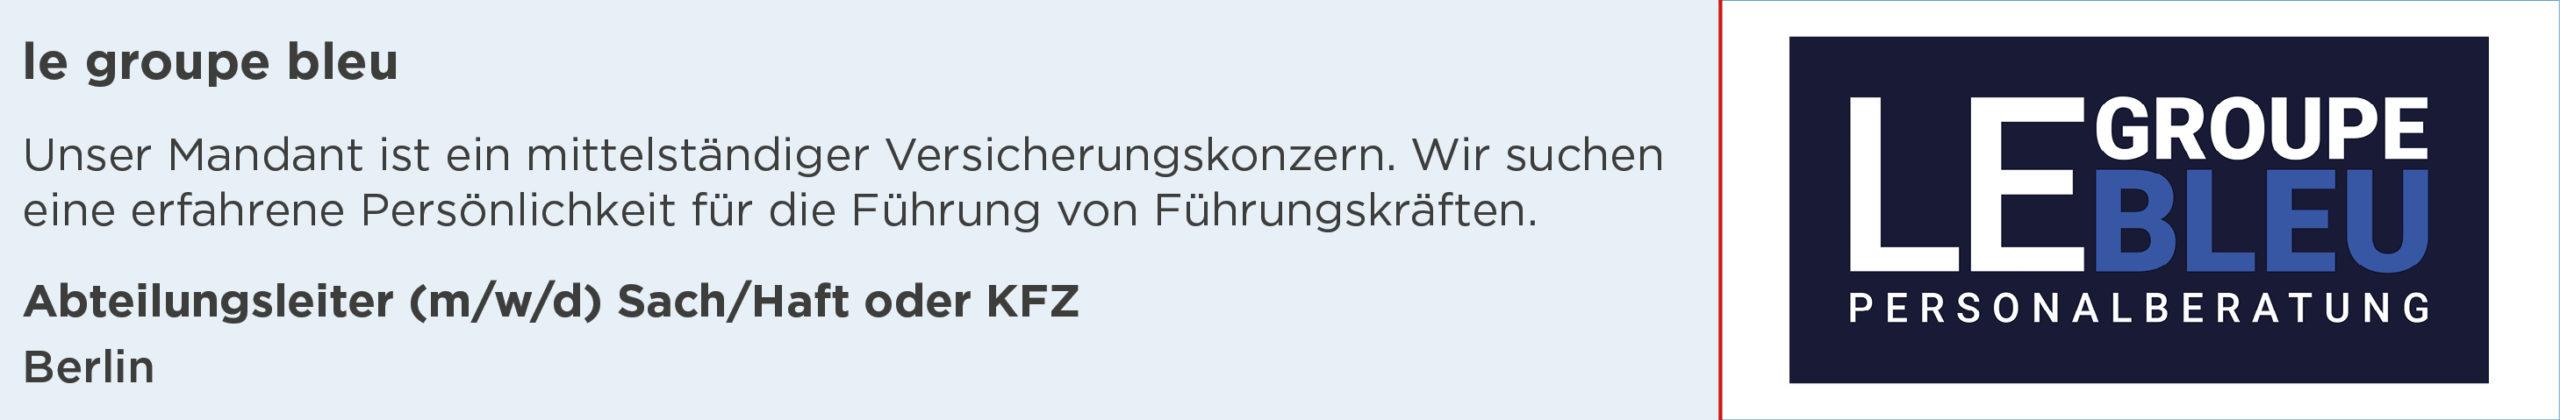 le groupe bleu, abteilungsleiter, sach, haft, kfz, stellenanzeige, berlin